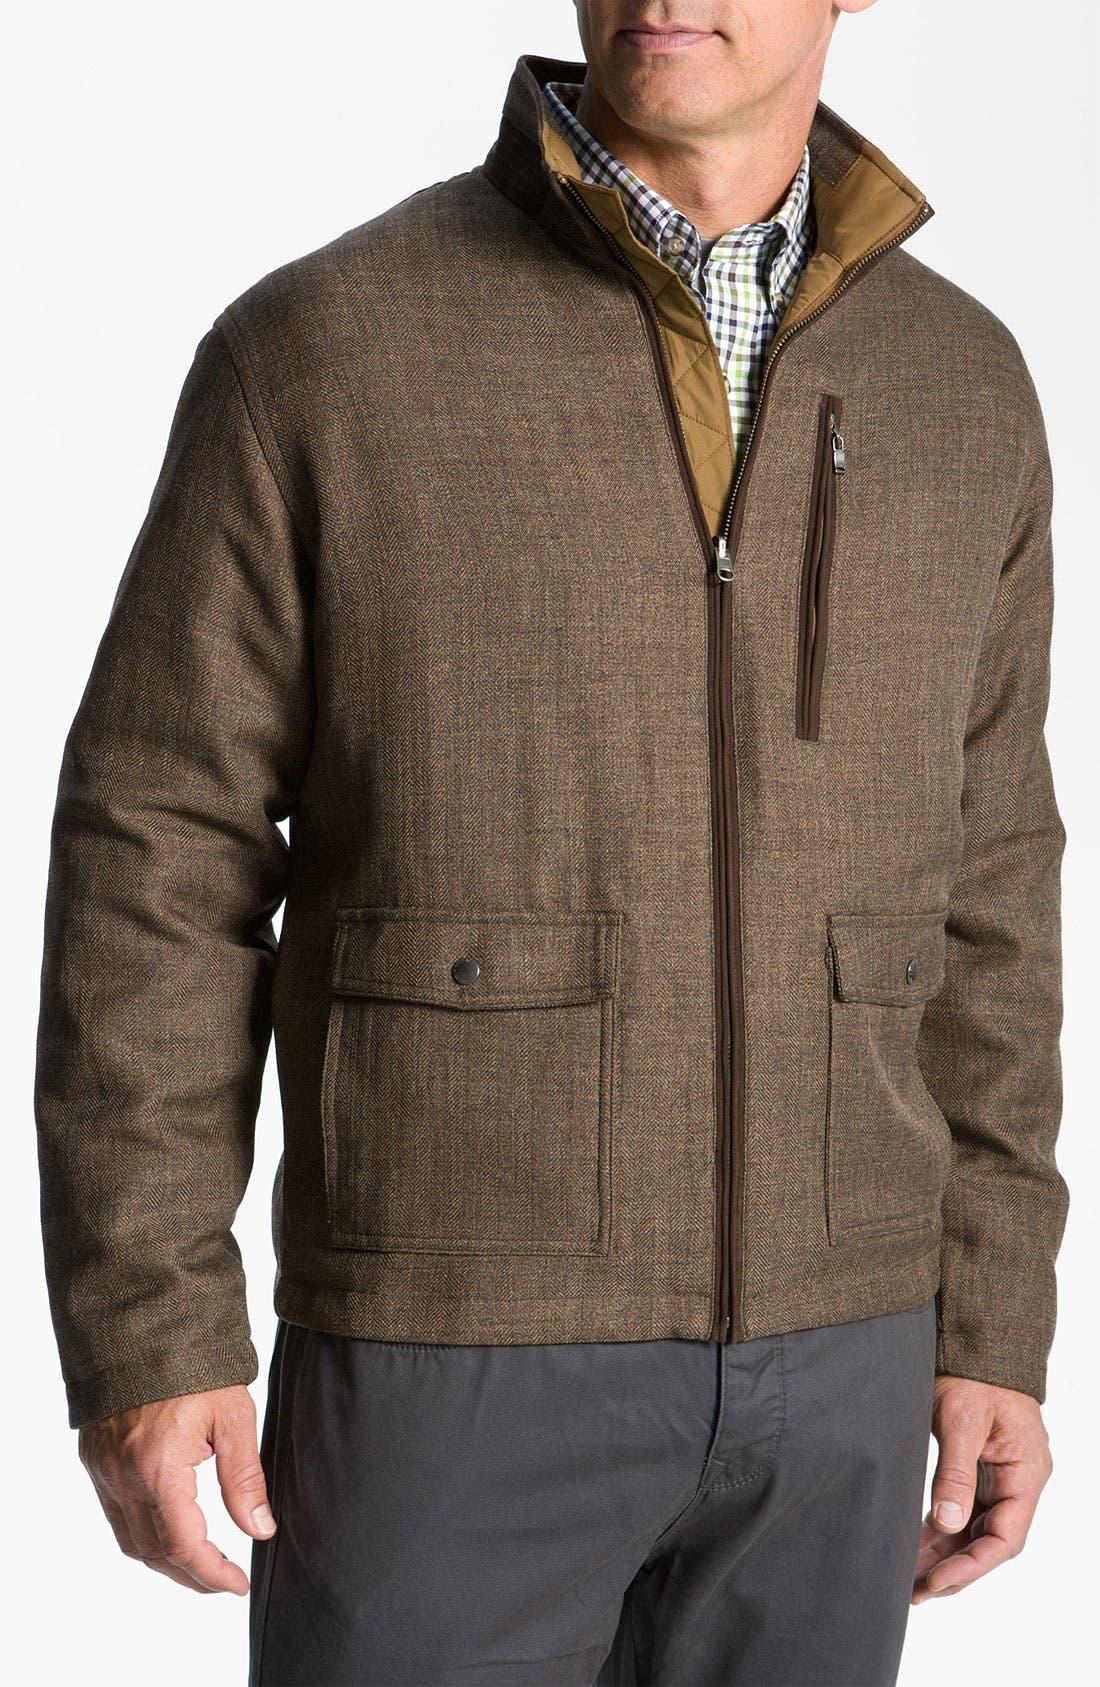 Alternate Image 1 Selected - Cutter & Buck 'WeatherTec Bearsden' Reversible Jacket (Online Only)